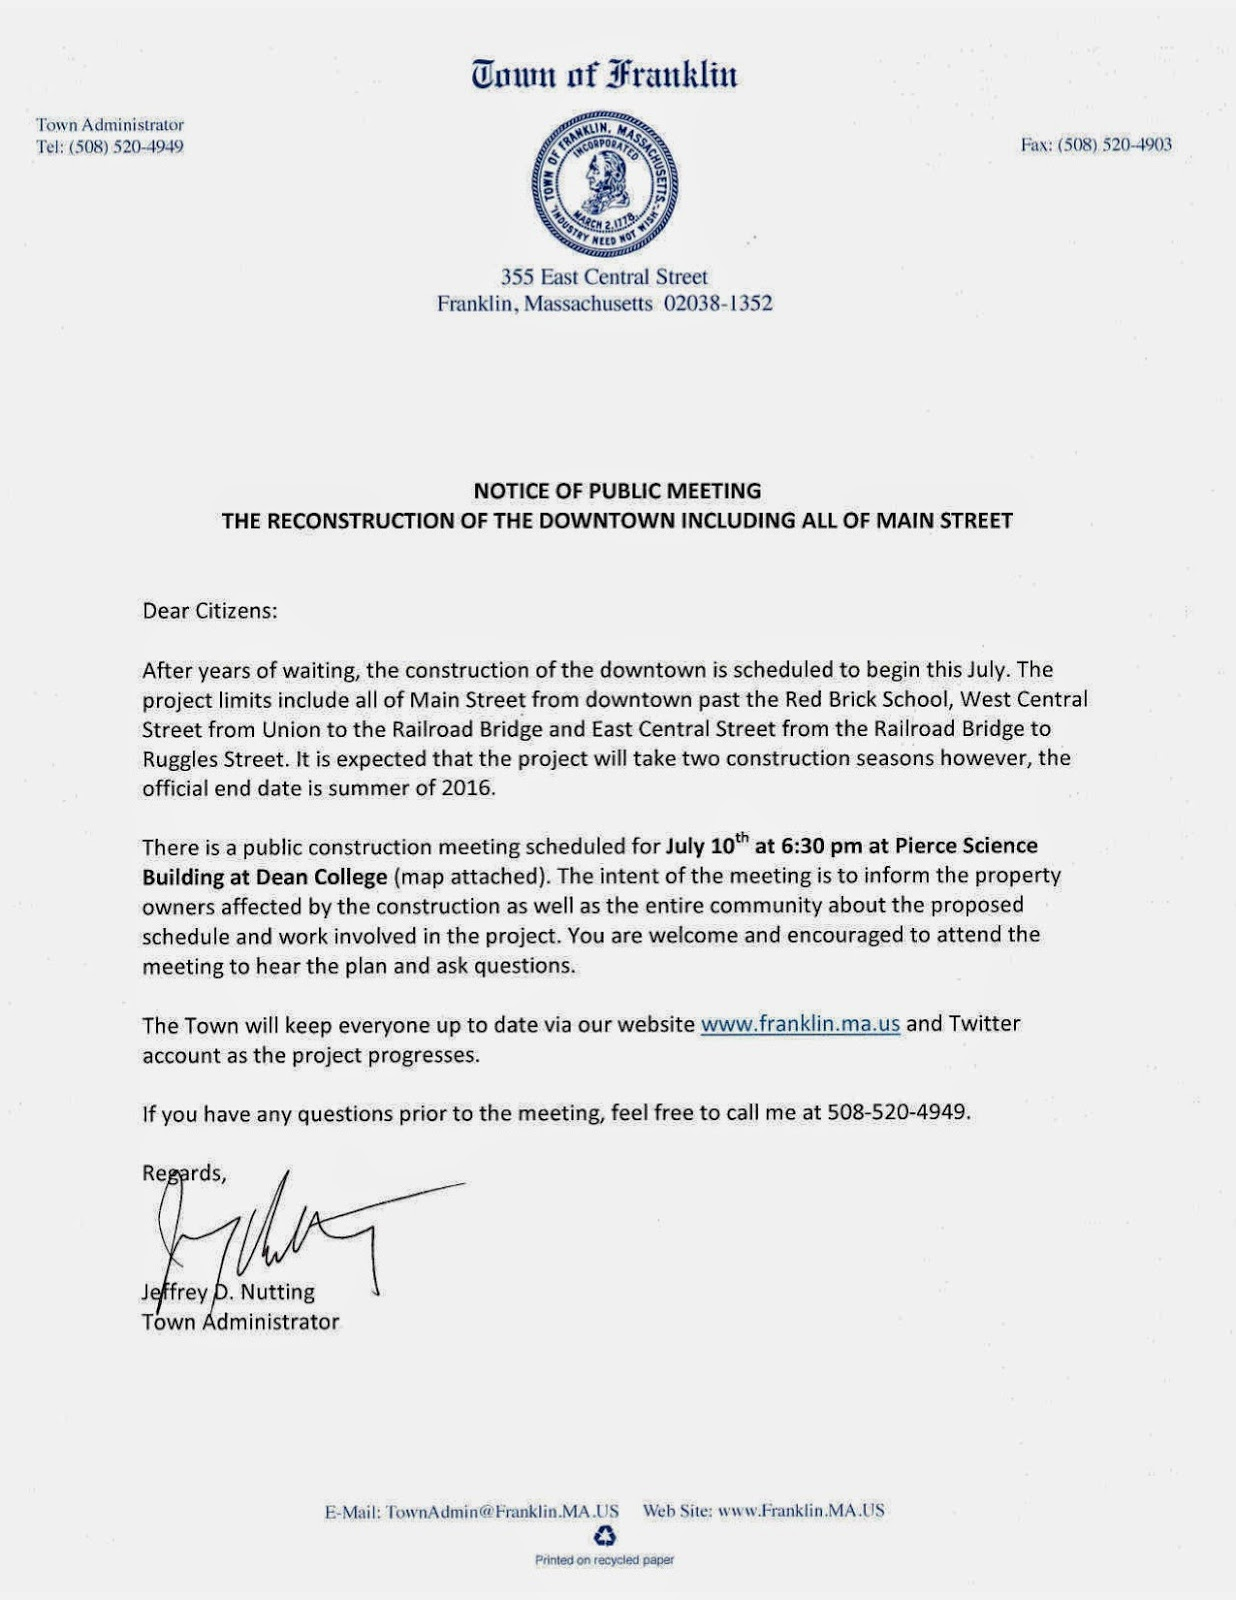 Franklin Downtown Partnership Reminder Pre Construction Meeting Thursday